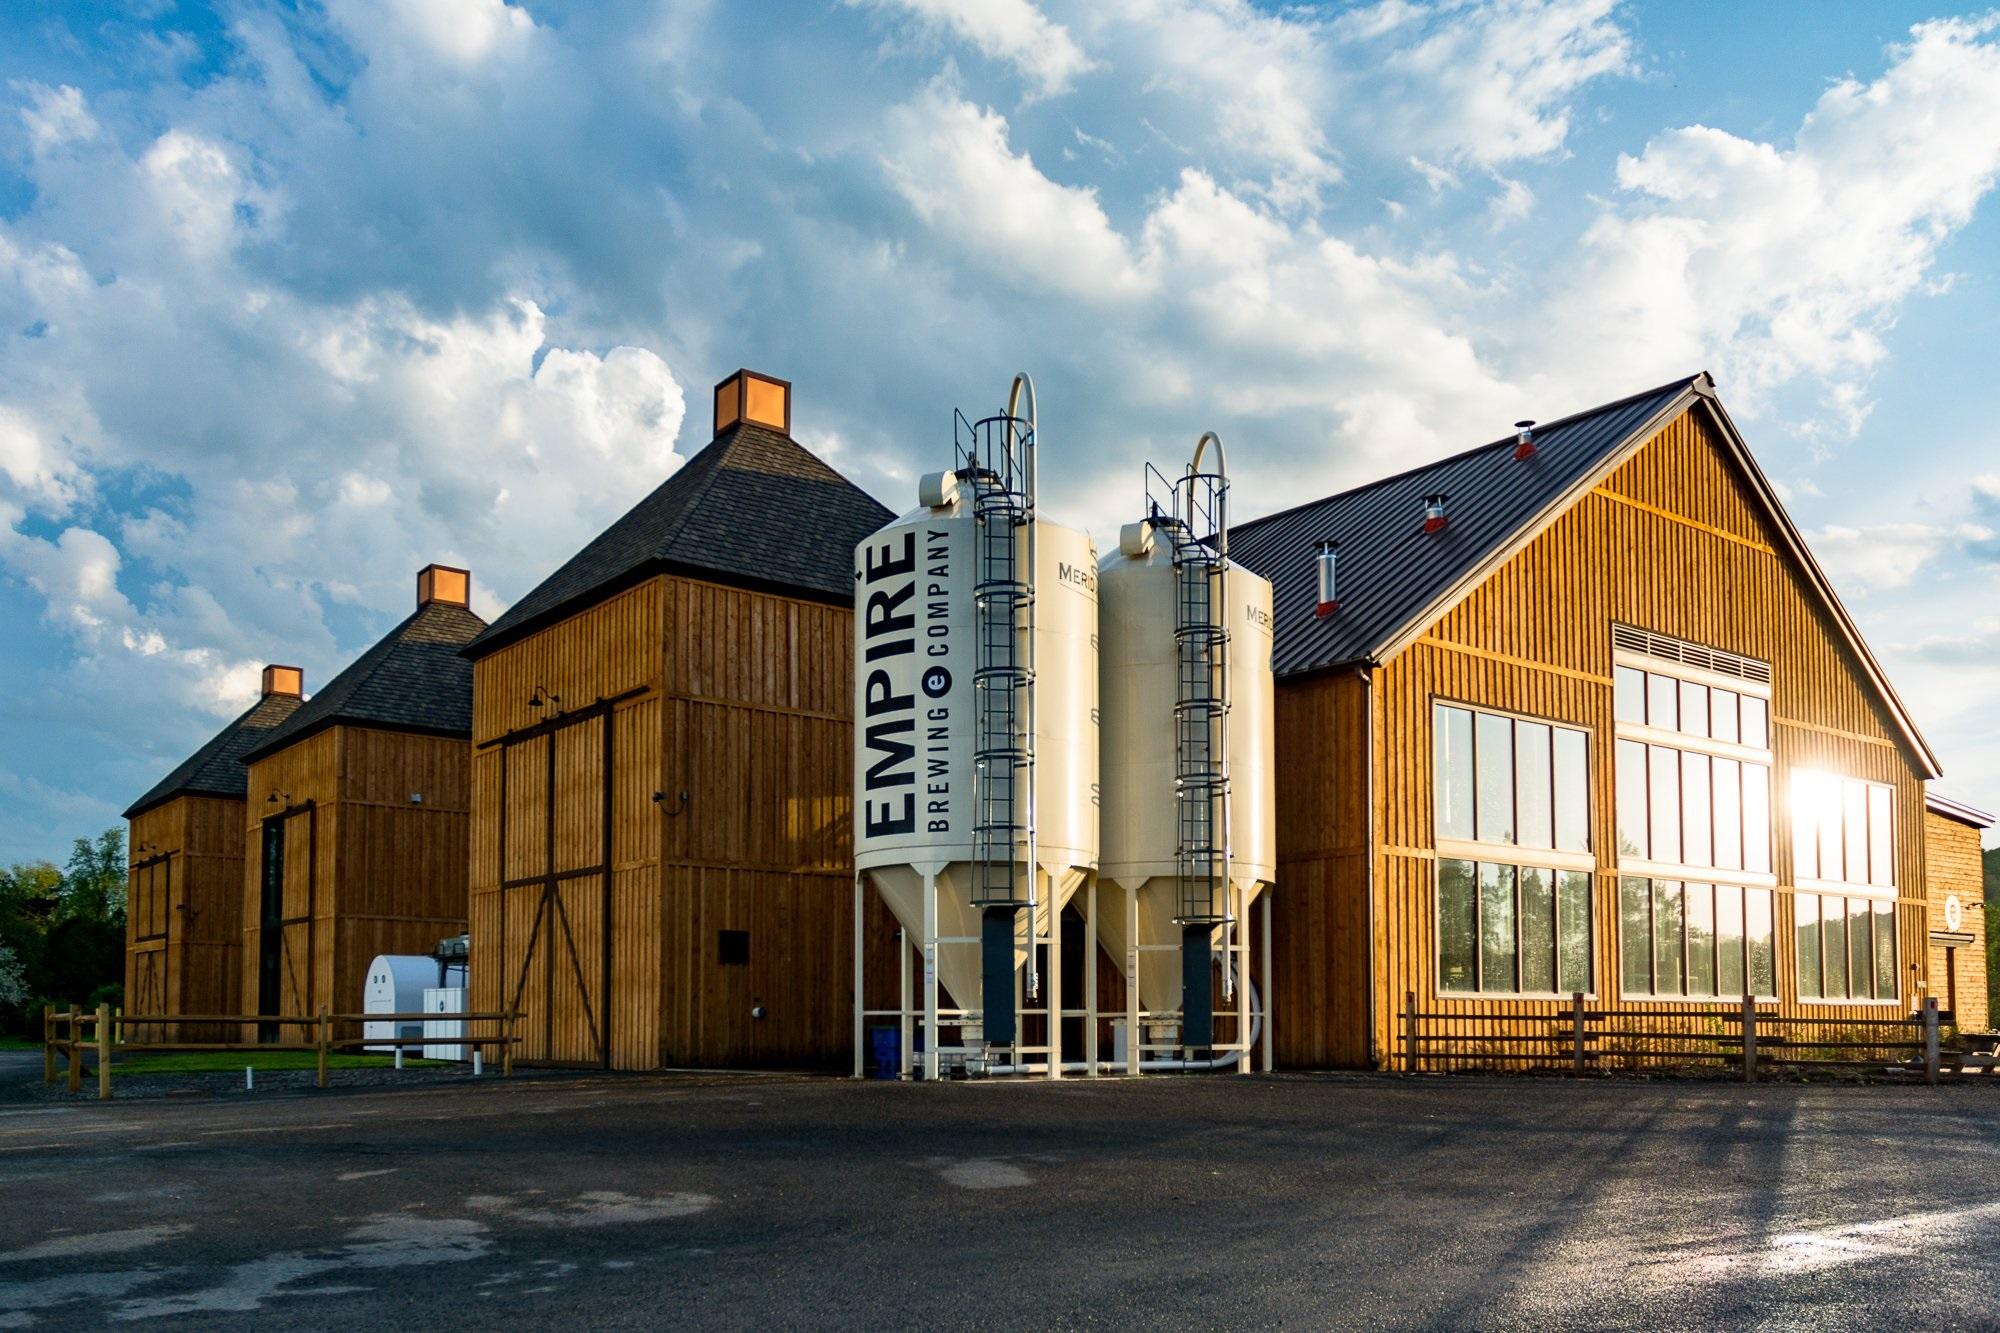 Cazenovia's Empire Brewery to reorganize in bankruptcy, remain open